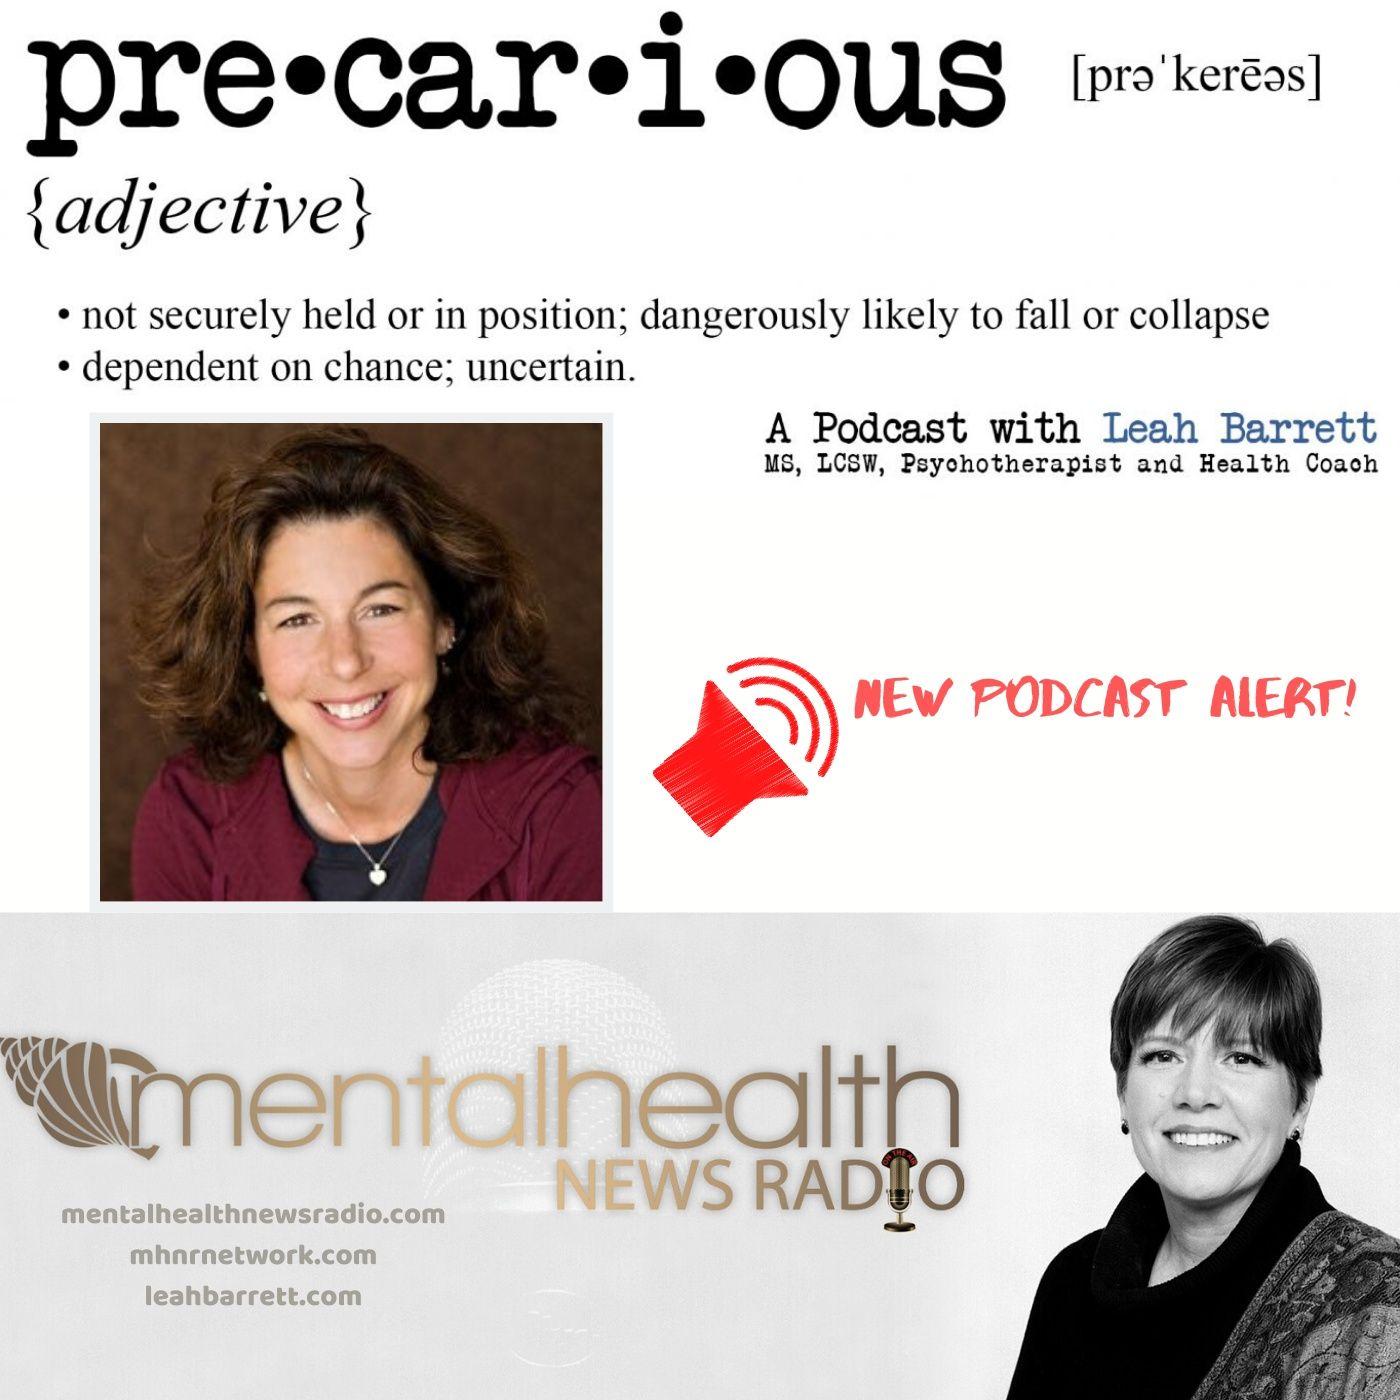 Mental Health News Radio - Life Threatening Illness and Mental Health